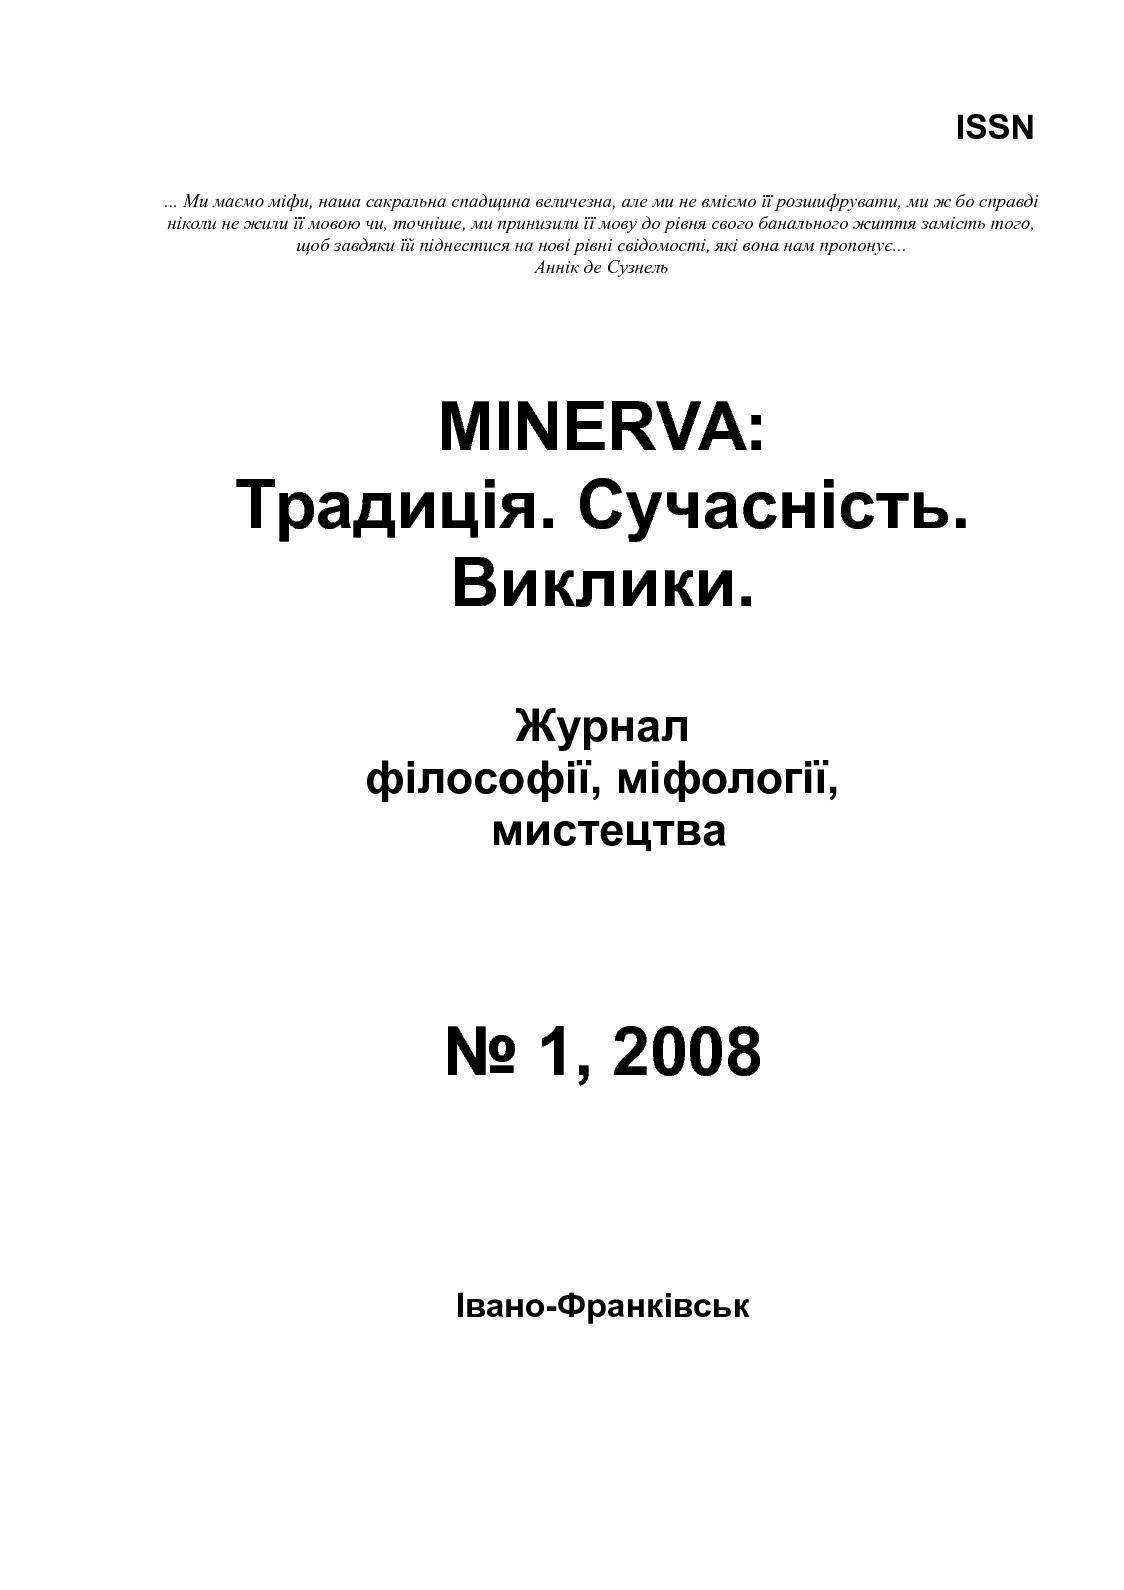 Calaméo - Minerva 5cc35cda1895b